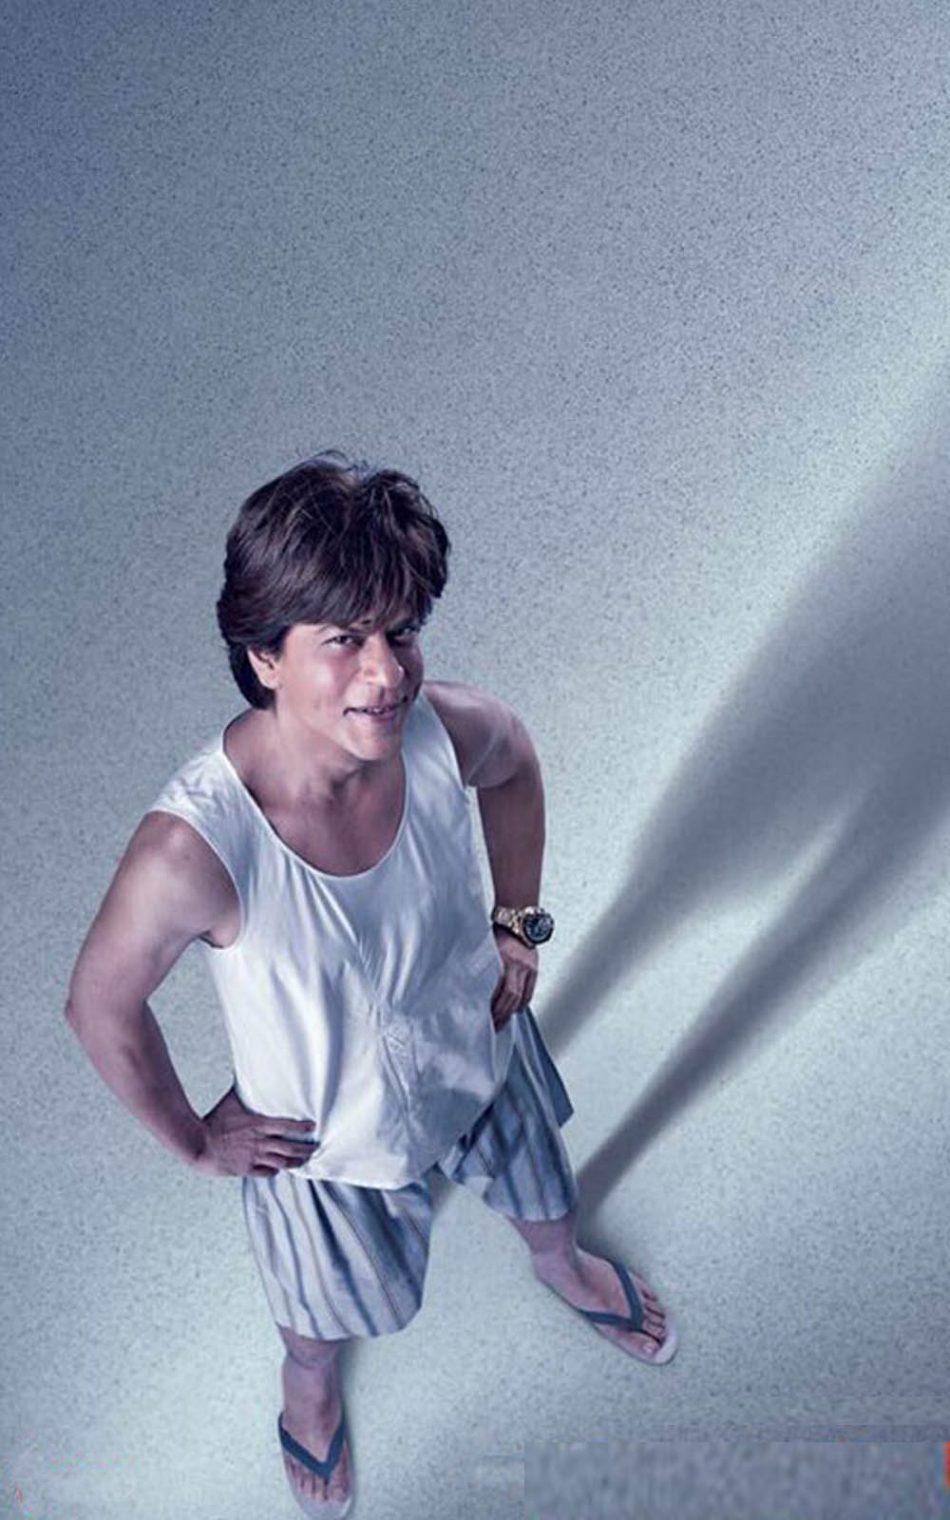 4k Anime Girl Wallpaper For Phones Download Shah Rukh Khan In Zero Free Pure 4k Ultra Hd